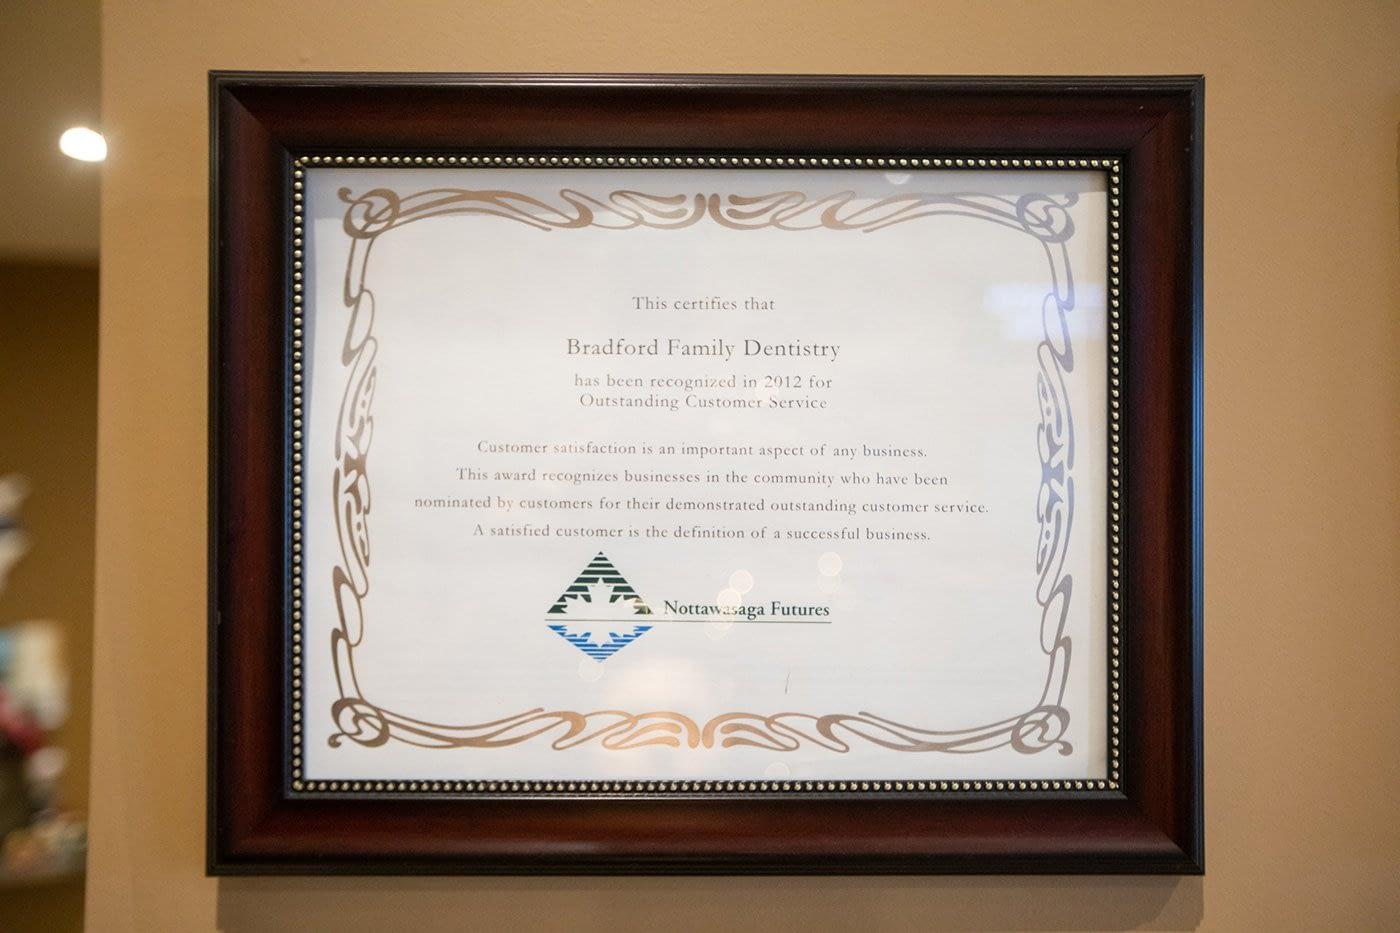 Outstanding Customer Service Award - Nottawasaga Futures - 2012